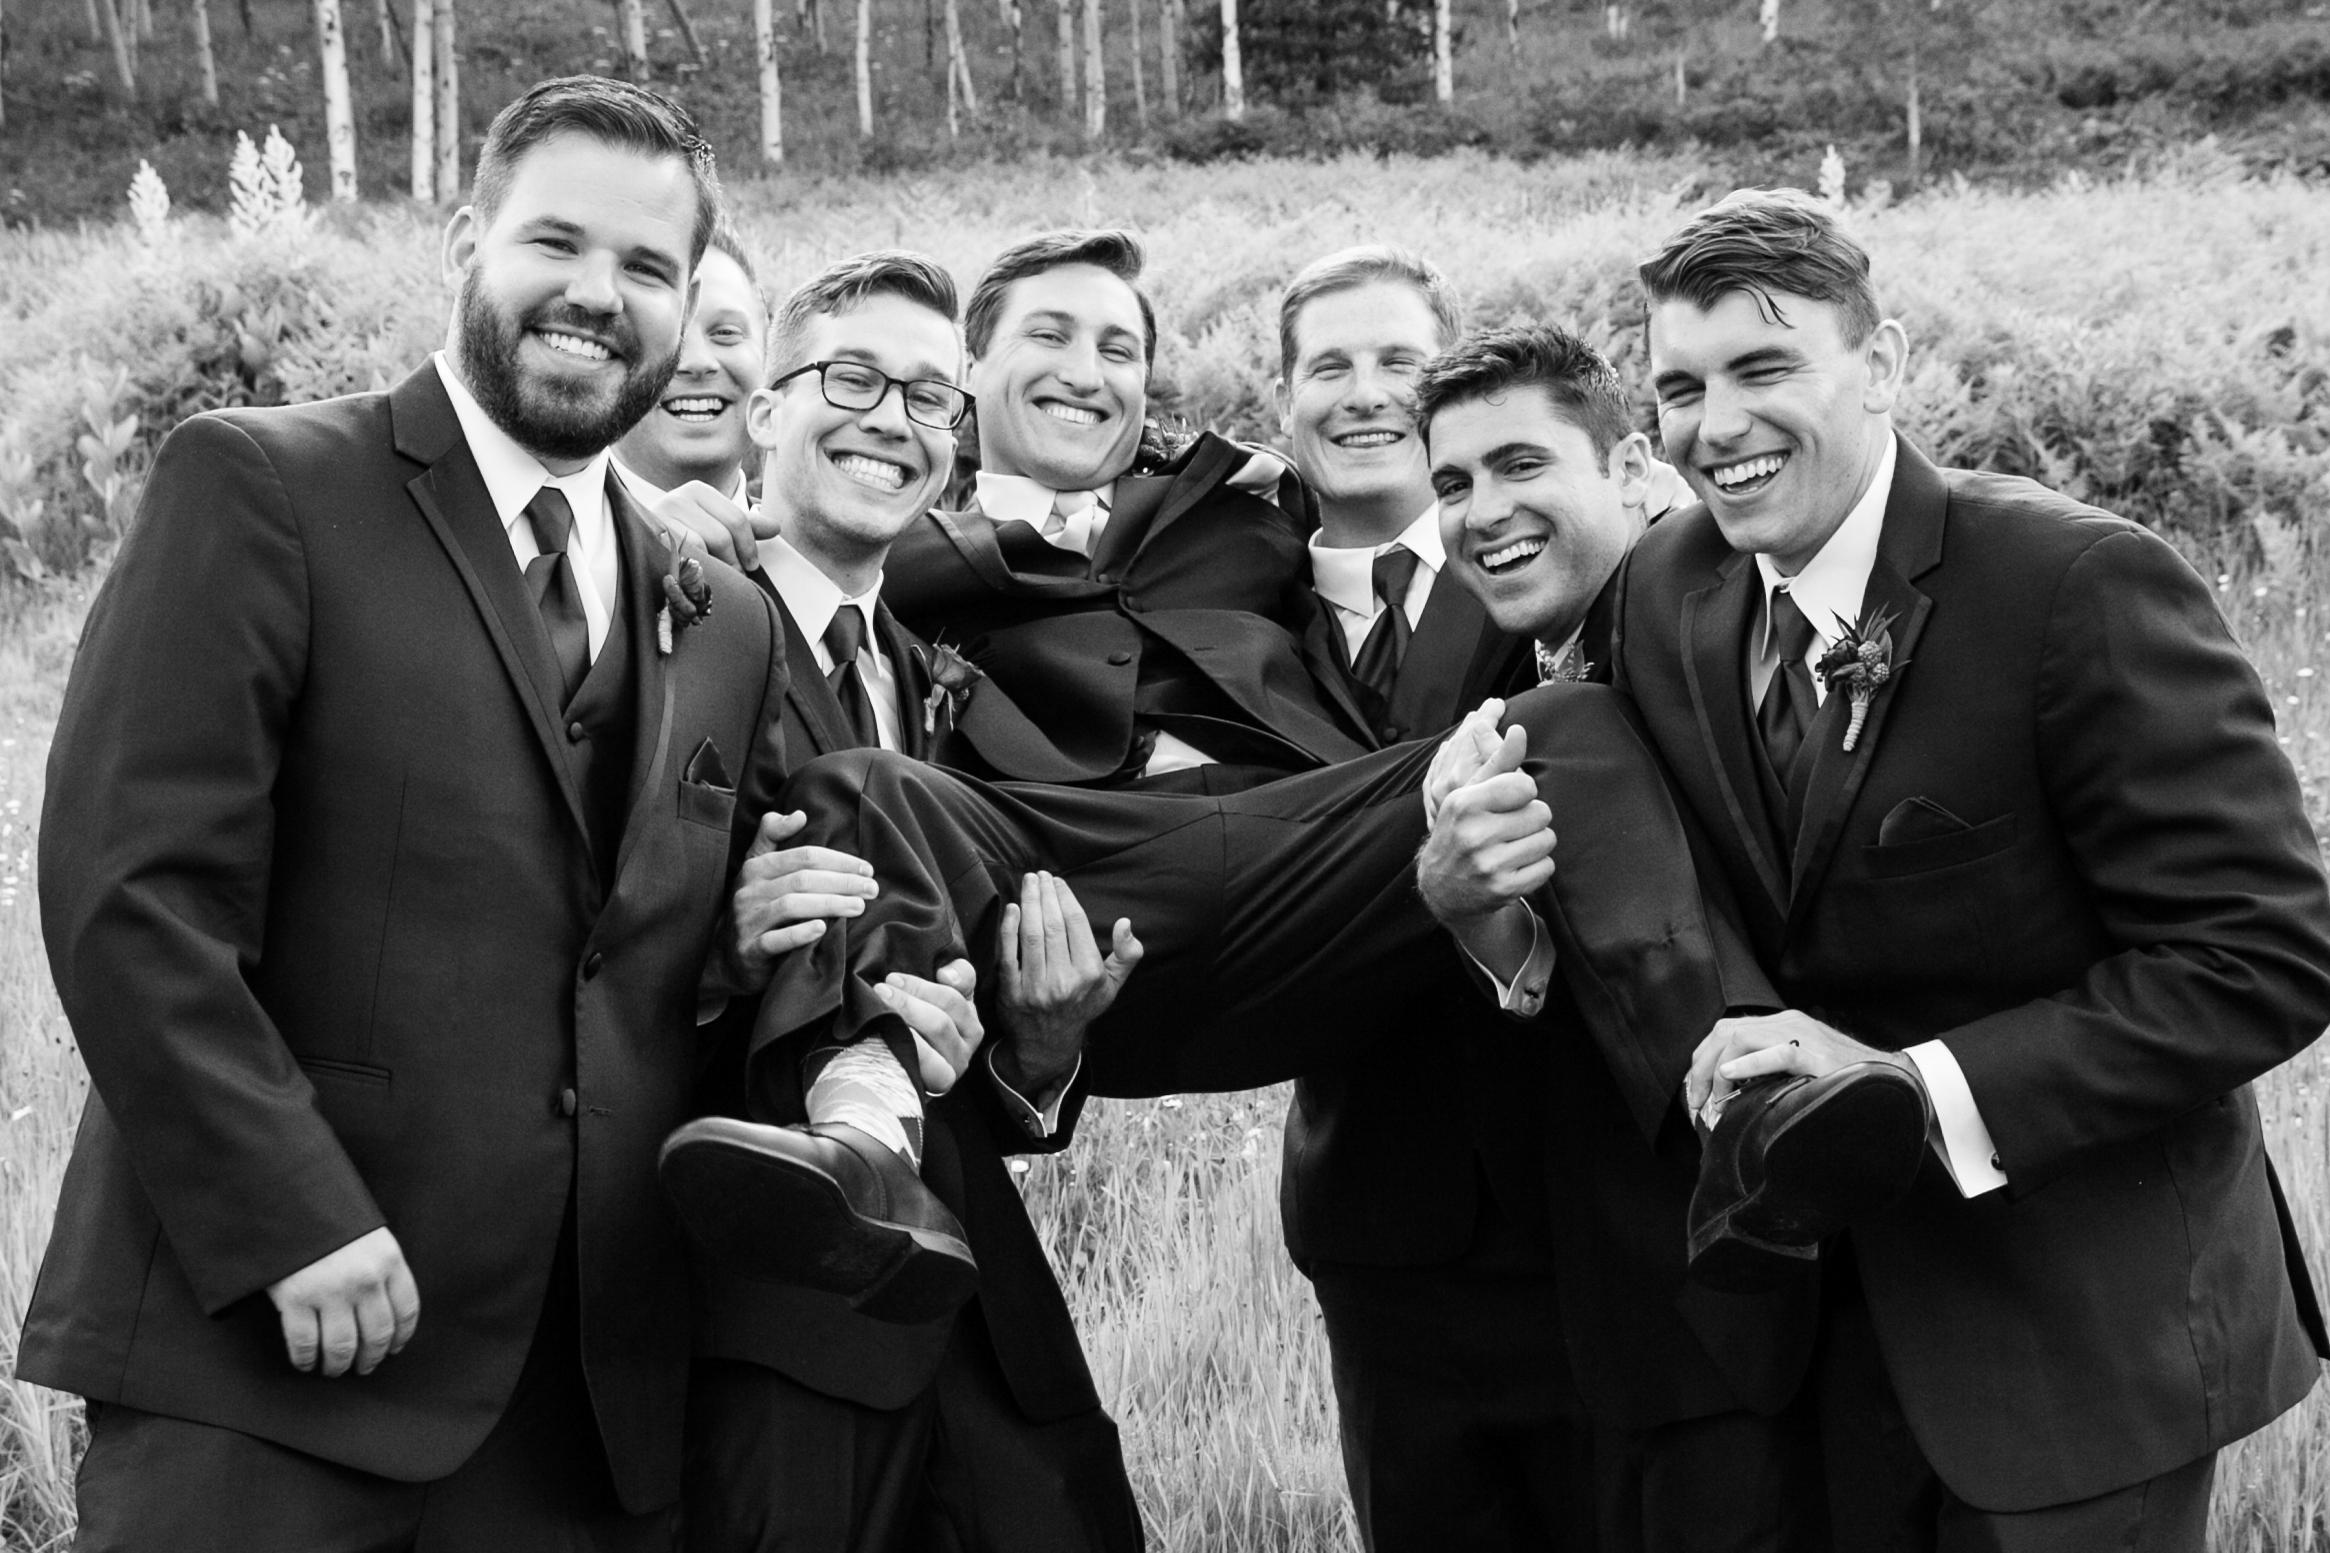 wedding-planners-vail-co-axelphoto.jpg